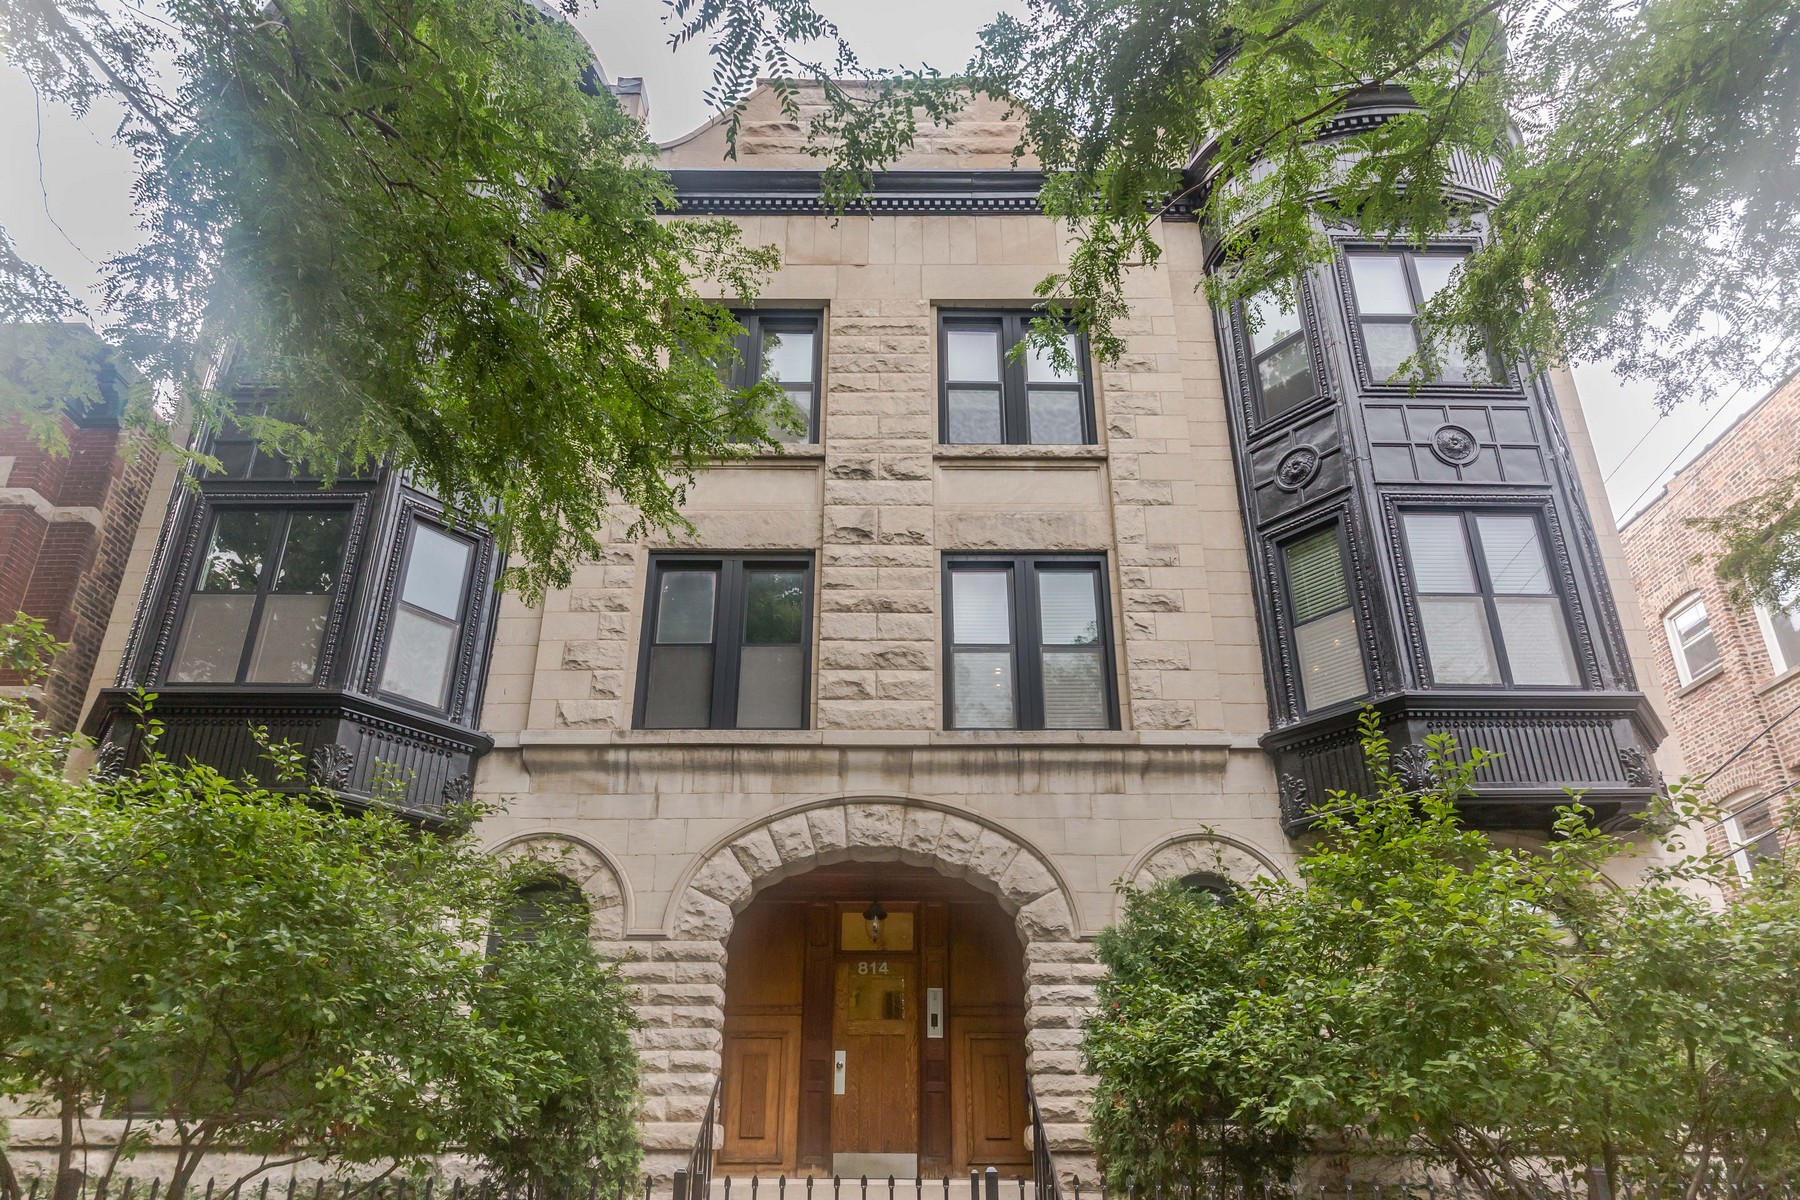 Condominium for Sale at Fantastic Lakeview Location 814 W Roscoe Street Unit 2E Chicago, Illinois, 60657 United States